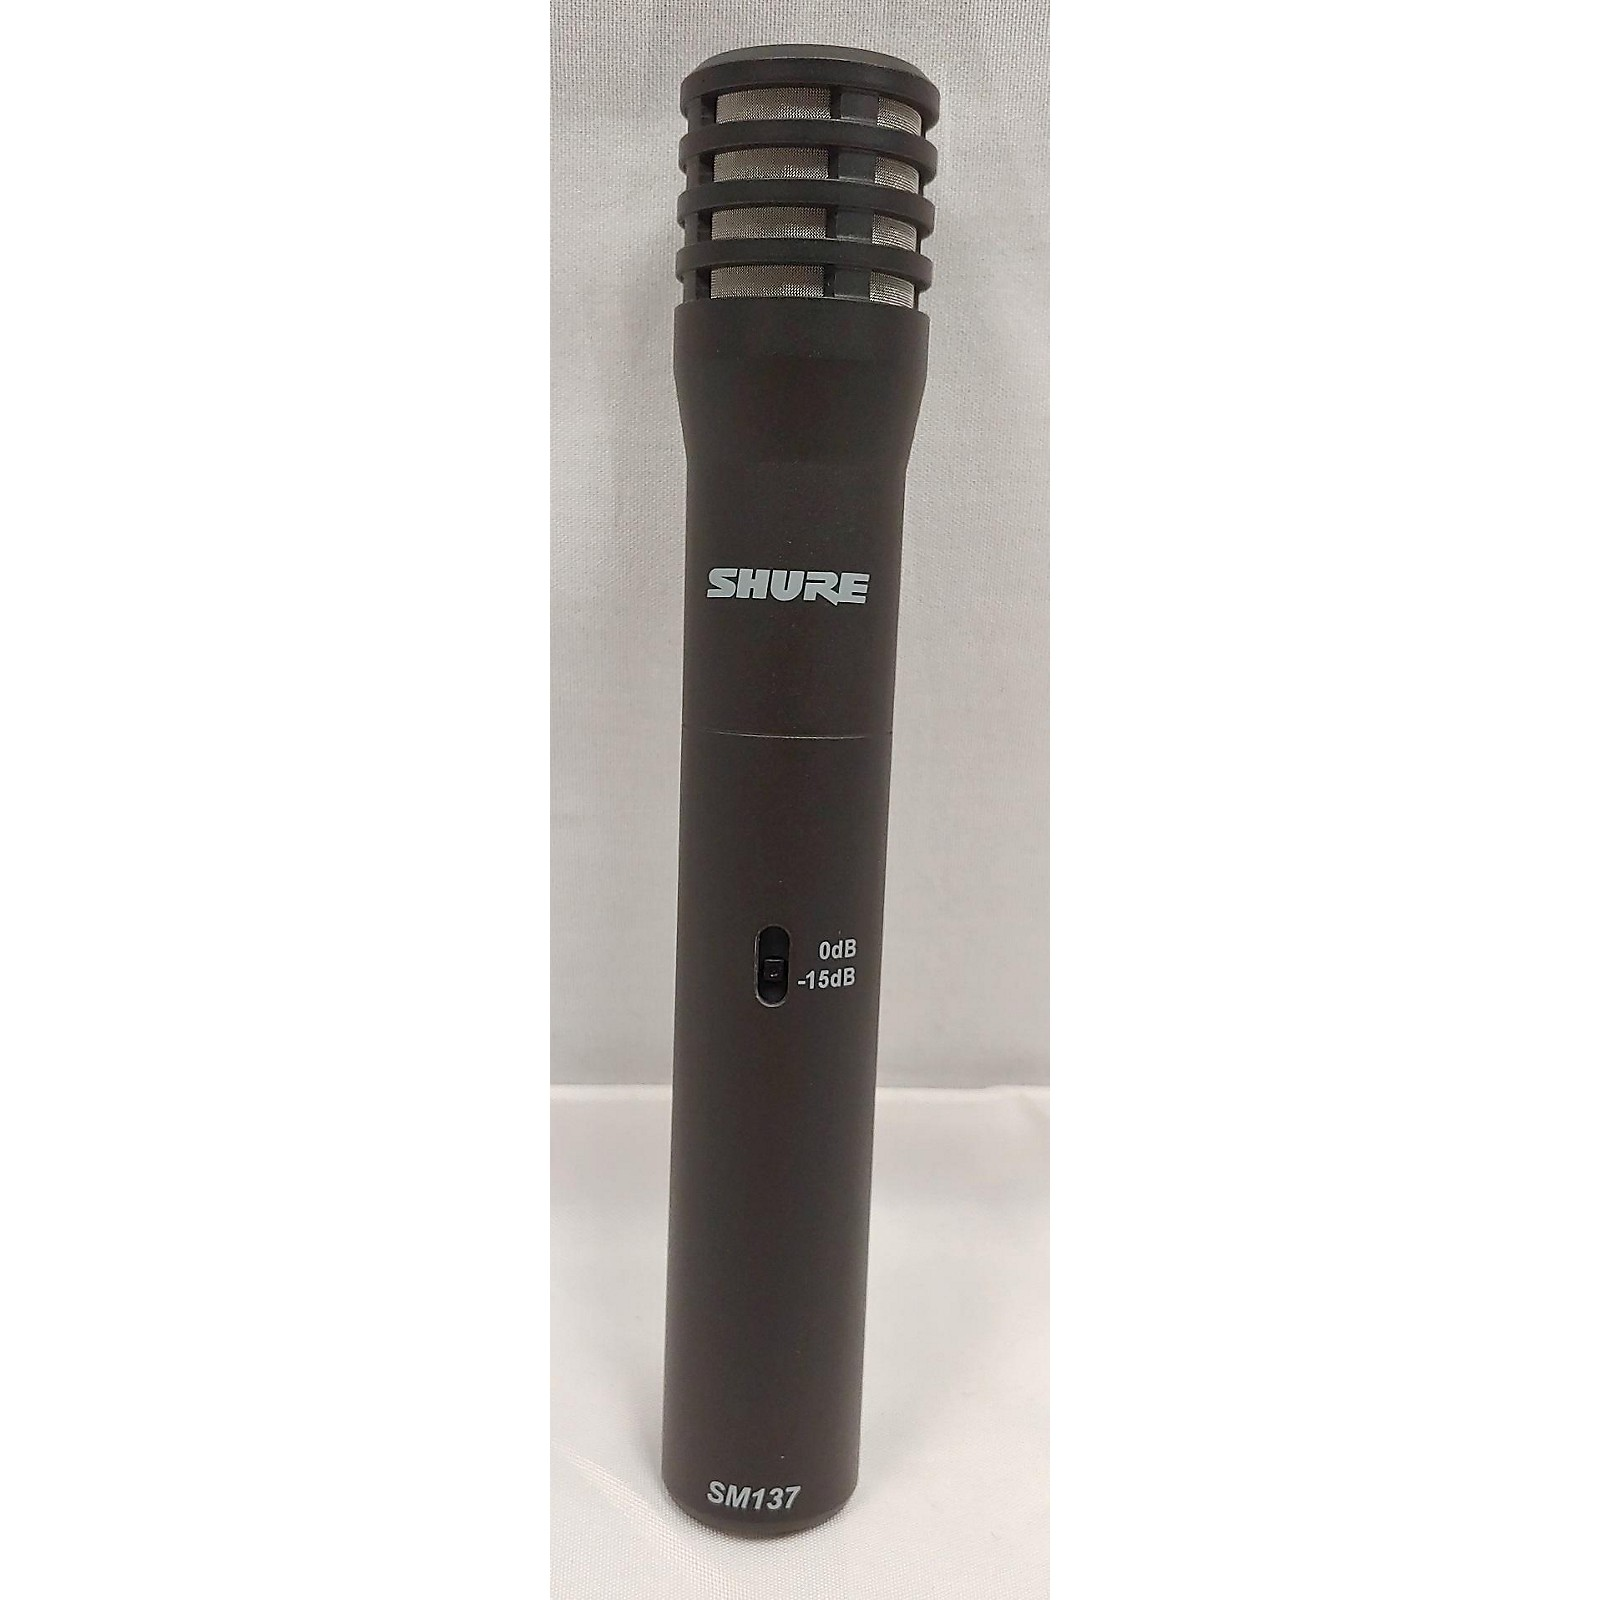 Shure SM137 Condenser Microphone